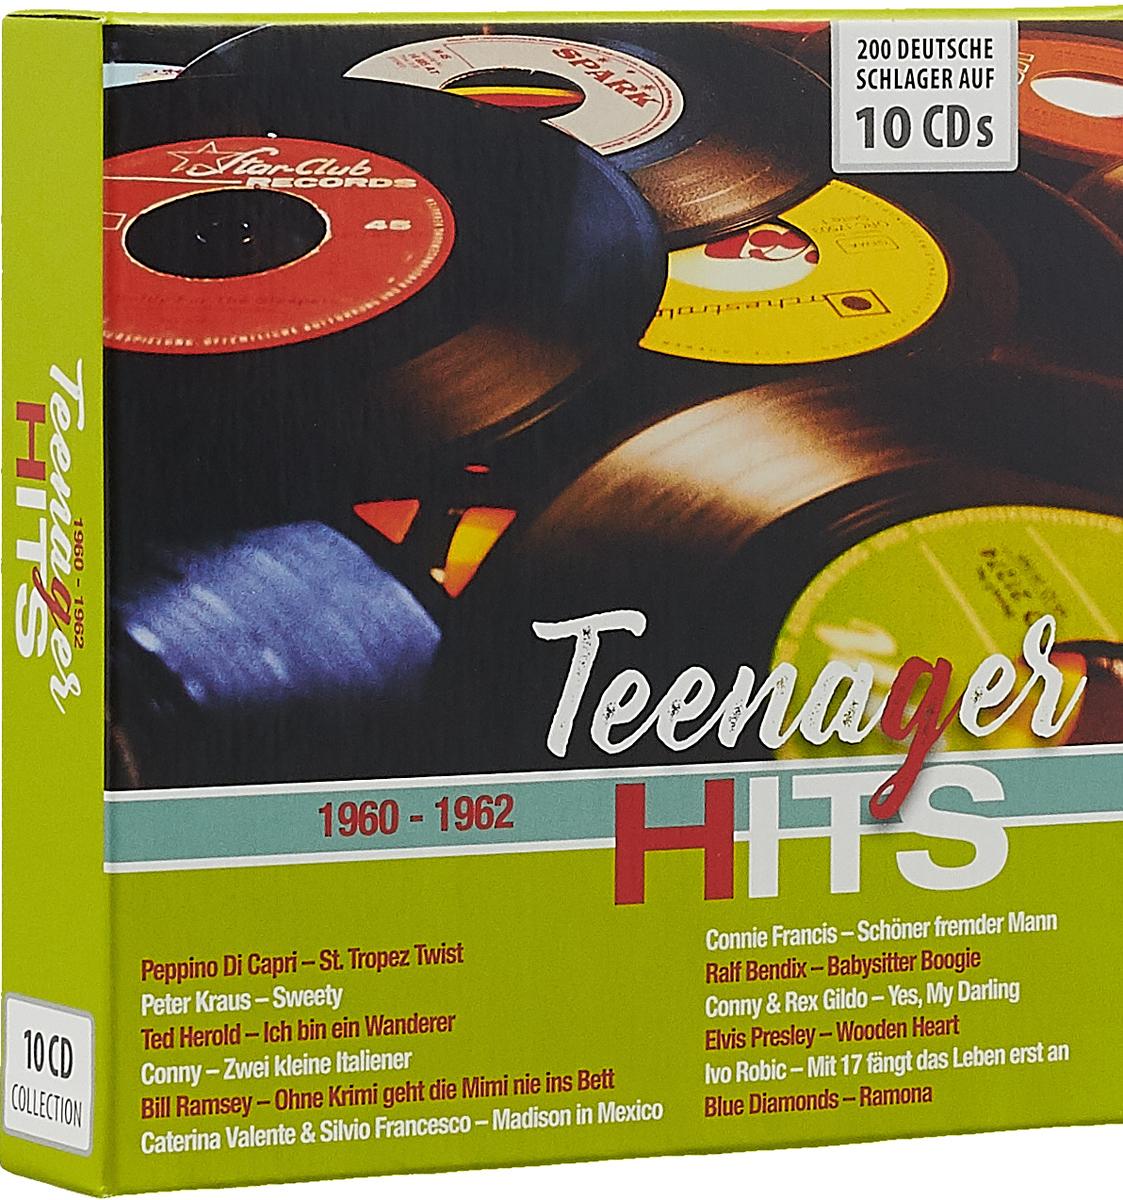 Рекс Гилдо,Нана Мускури Teenager Hits (10 CD) roland kaiser fernando express рекс гилдо ibo питер орлоф томми стейнер андреа джаргес патрик линдлер disco fox charts der 80er jahre 2 cd